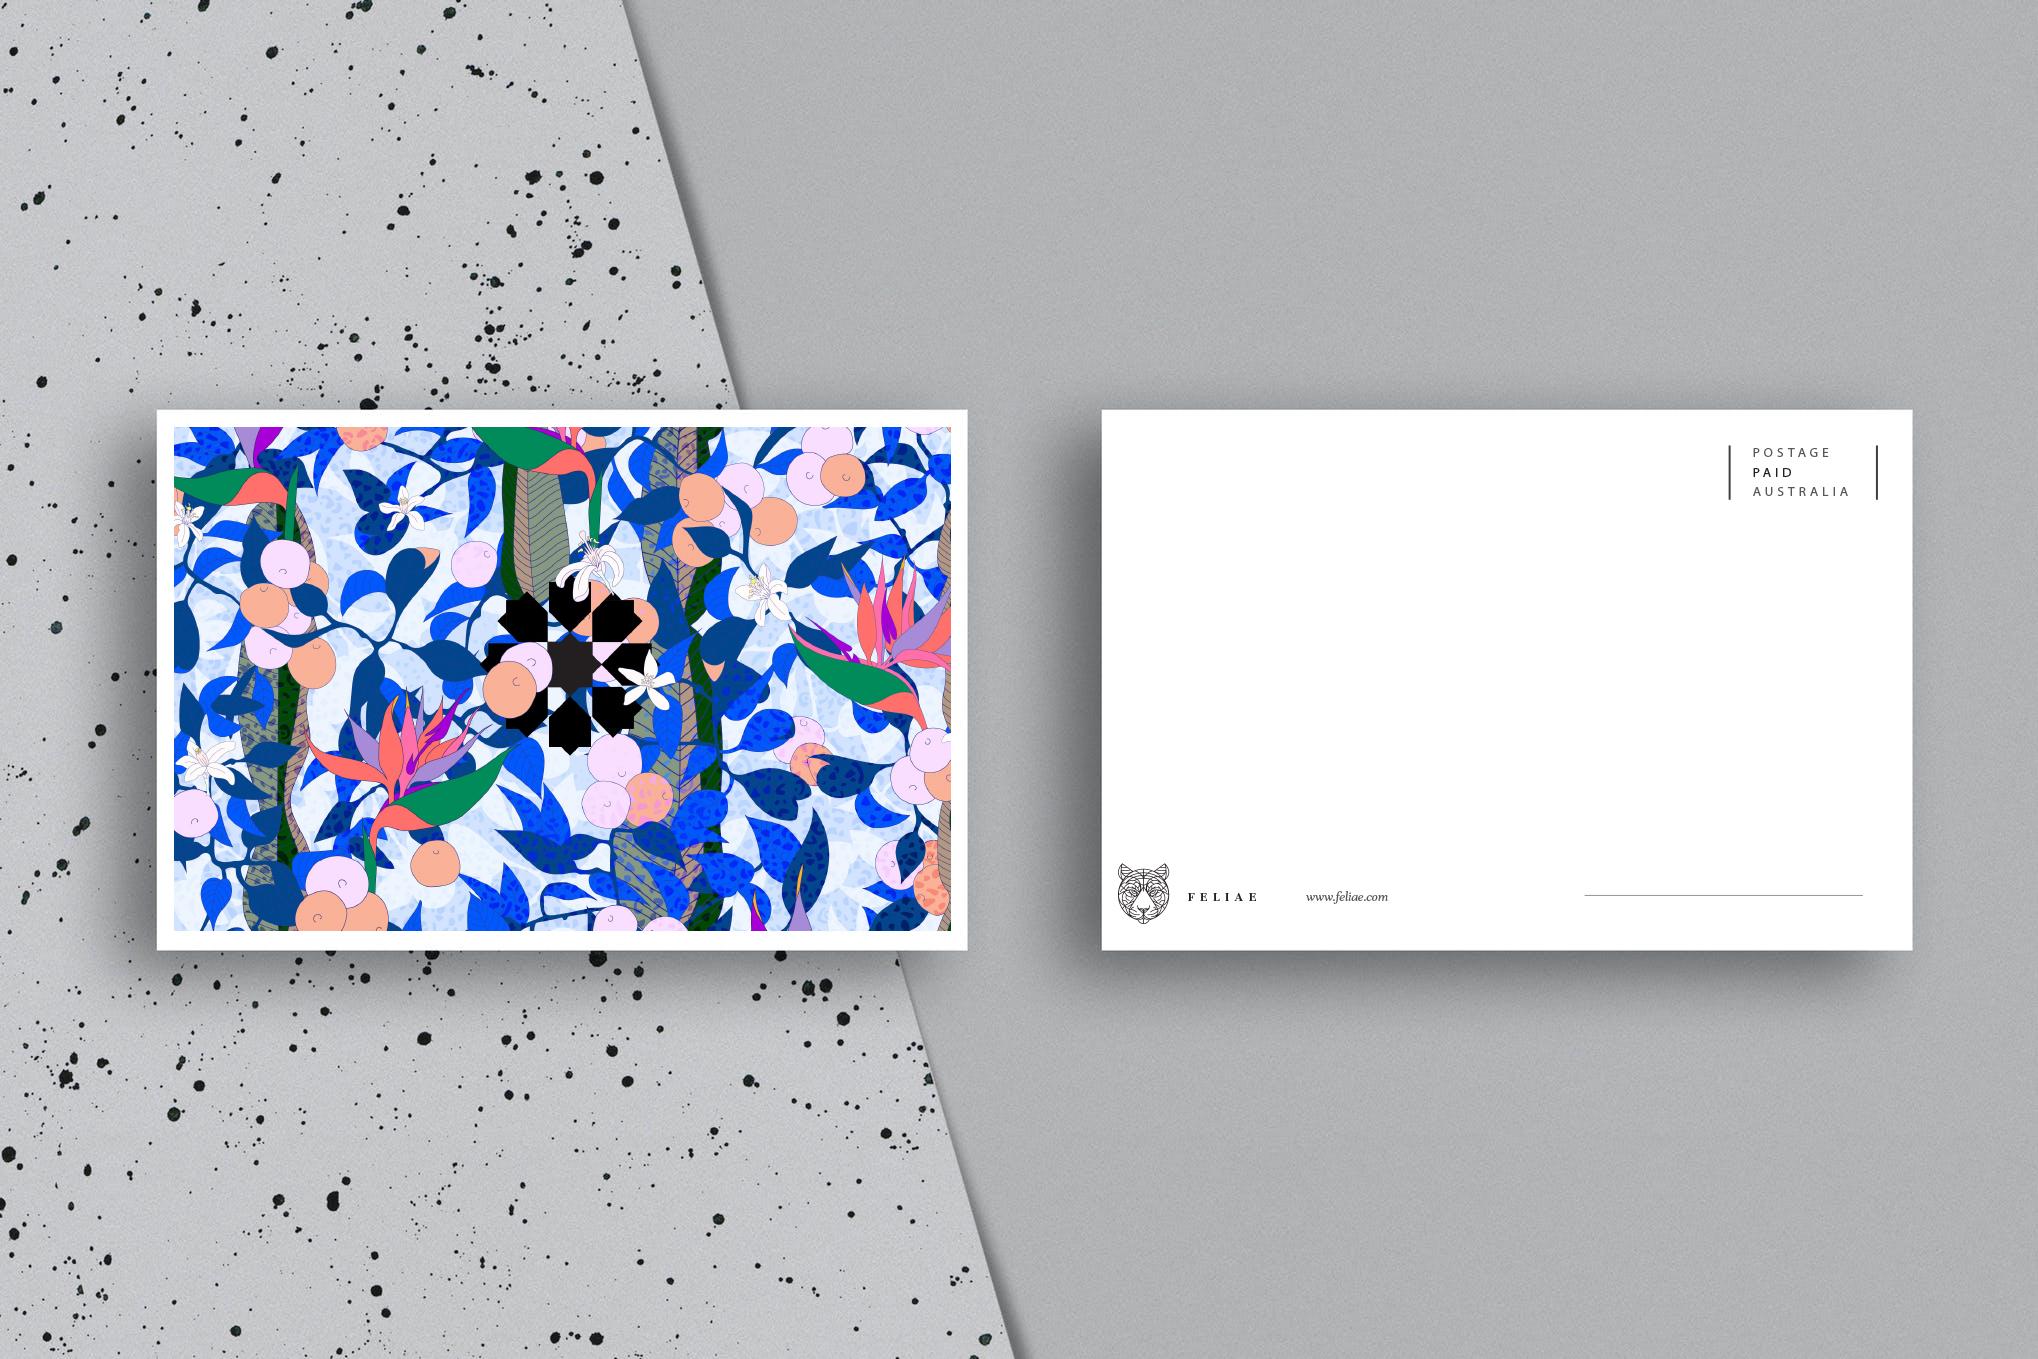 postcard-1498230247.jpg